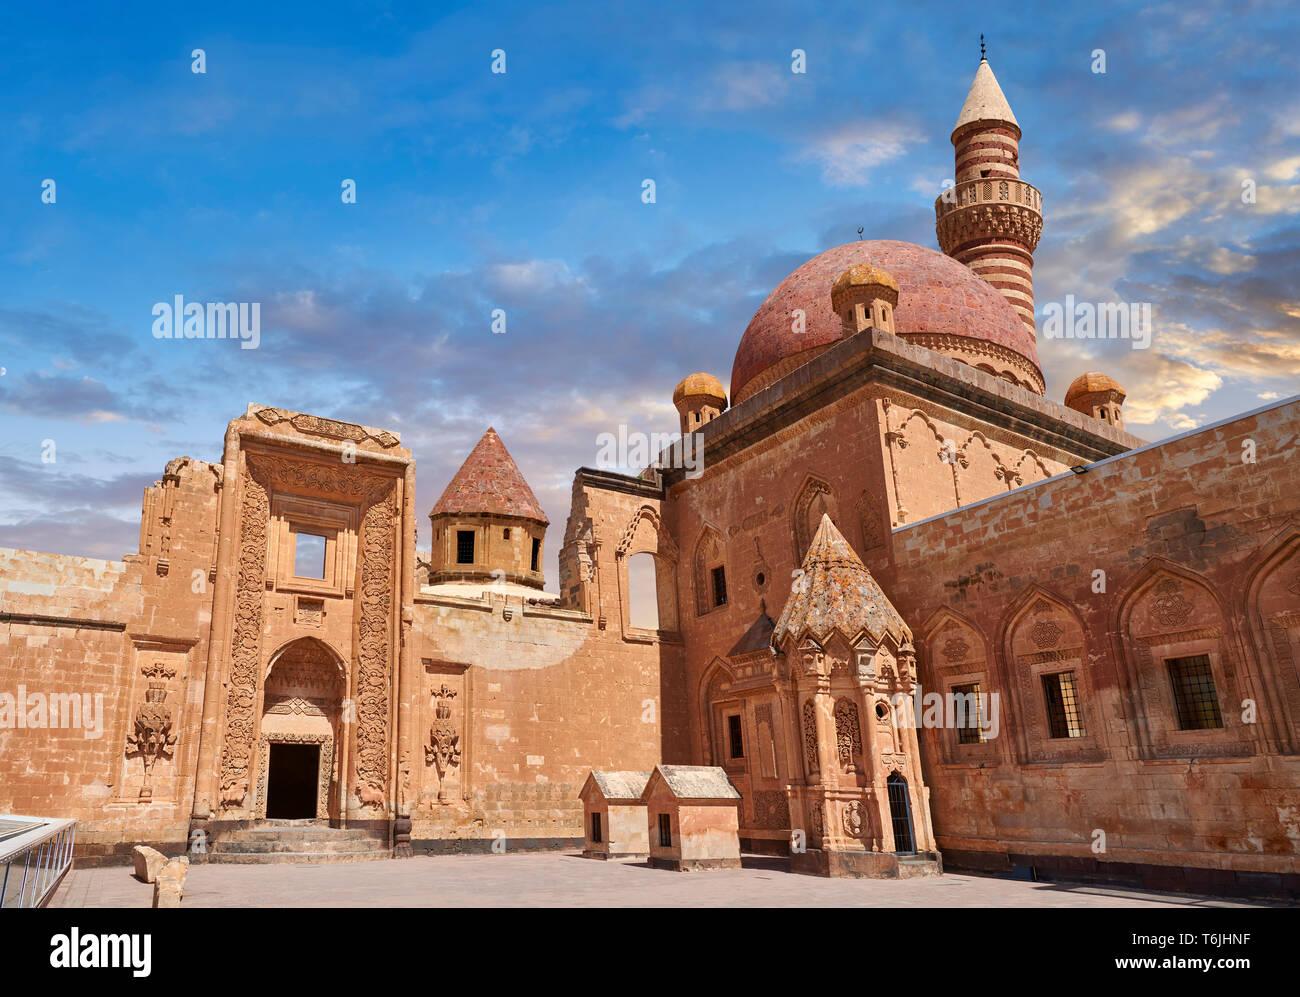 Courtyard of the 18th Century Ottoman architecture of the Ishak Pasha Palace (Turkish: İshak Paşa Sarayı) ,  Ağrı province of eastern Turkey. Stock Photo